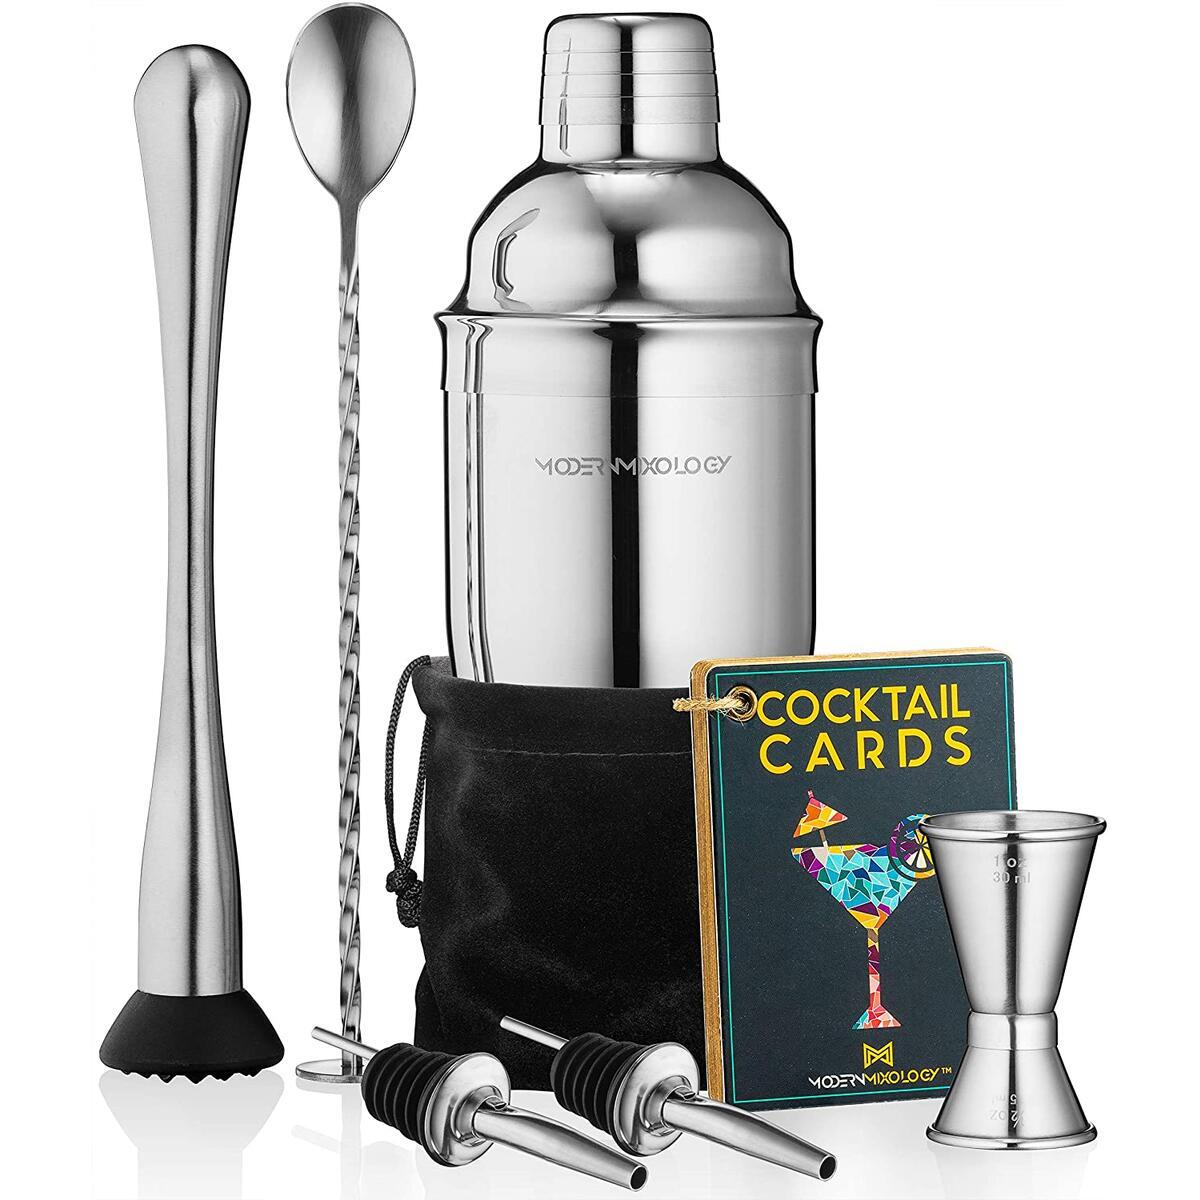 Cocktail Shaker Set Drink Mixer // 8-piece Portable Bartender Kit with 24oz Martini Shaker Bar Tool Set // 2 Pourers // Muddler // Jigger // Mixing Spoon // Velvet Bag // Built-in Strainer (Silver)